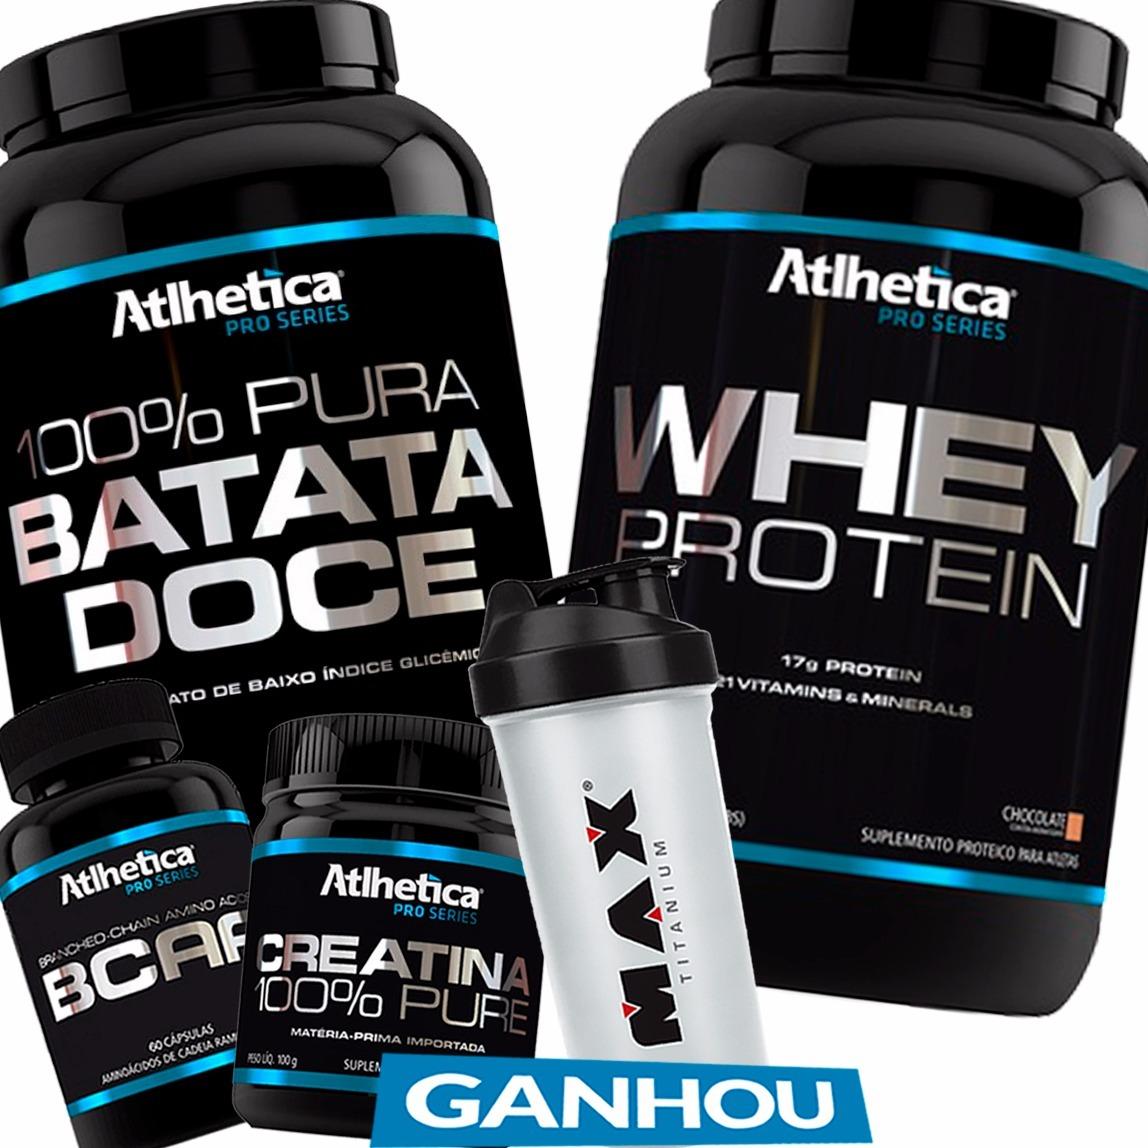 18fc280a0 kit crescimento muscular batata doce- whey protein brinde. Carregando zoom.